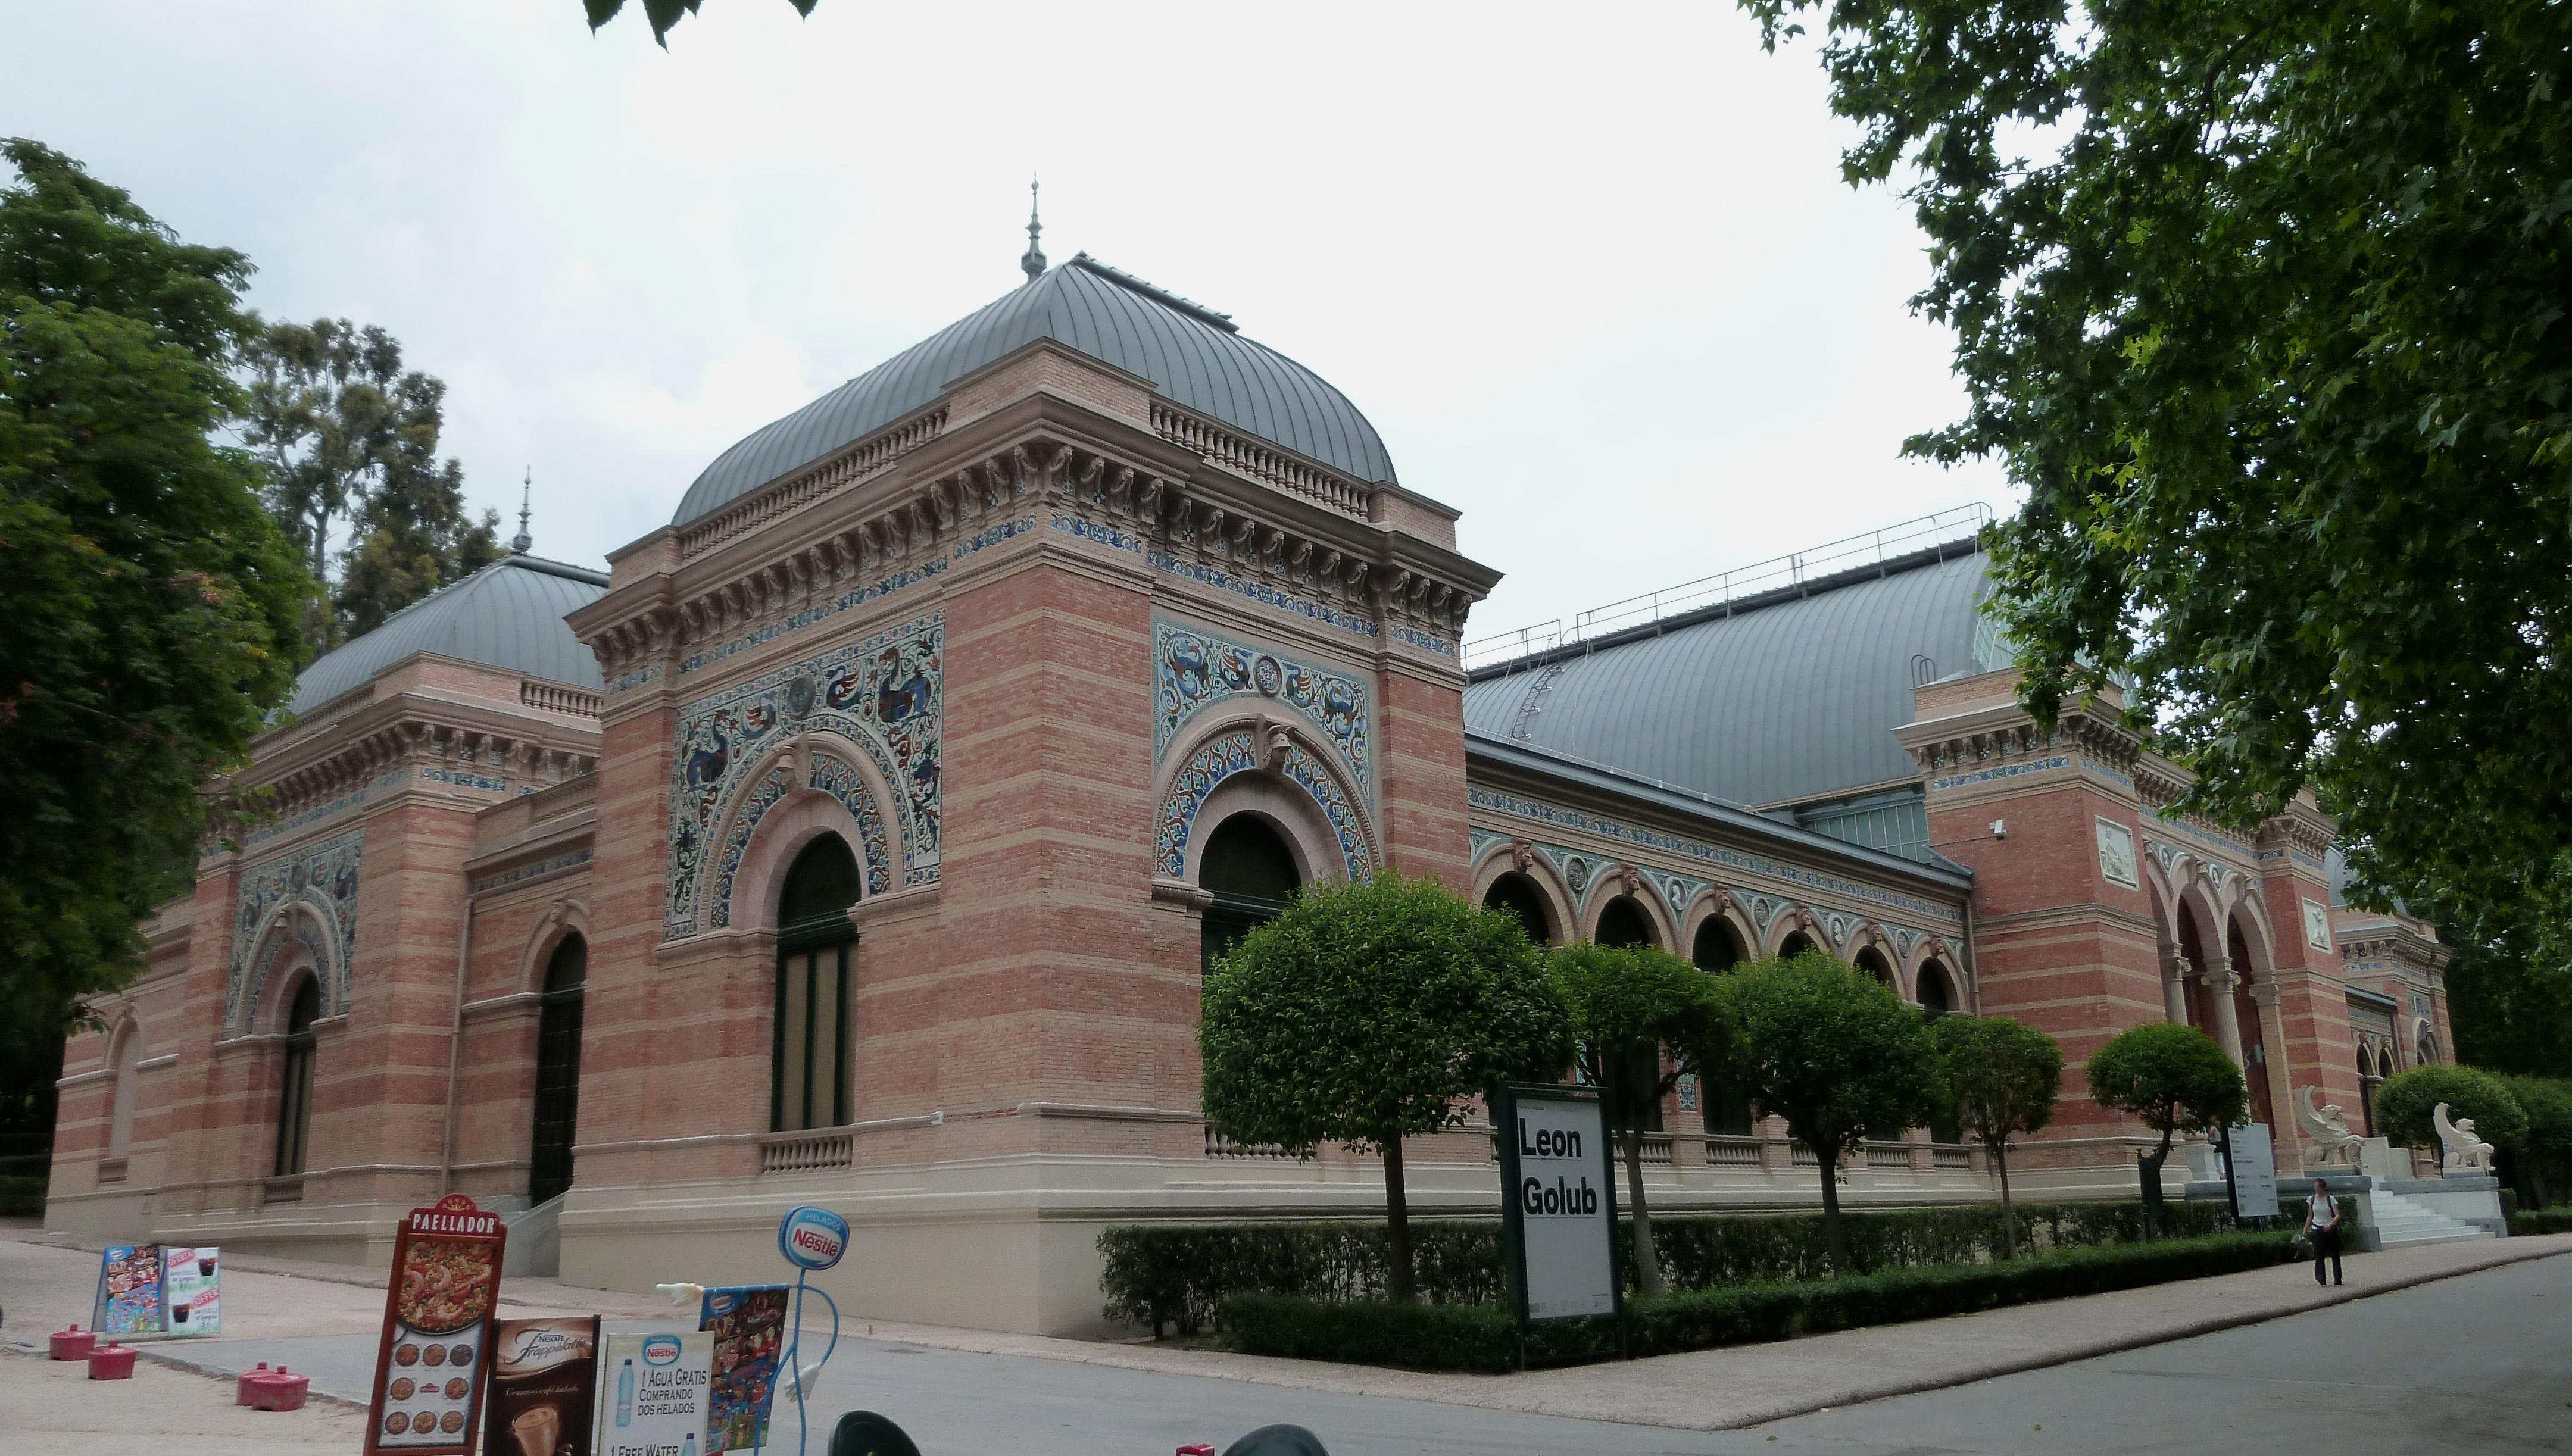 File:Palacio de Velázquez (Madrid) 05.jpg - Wikimedia Commons